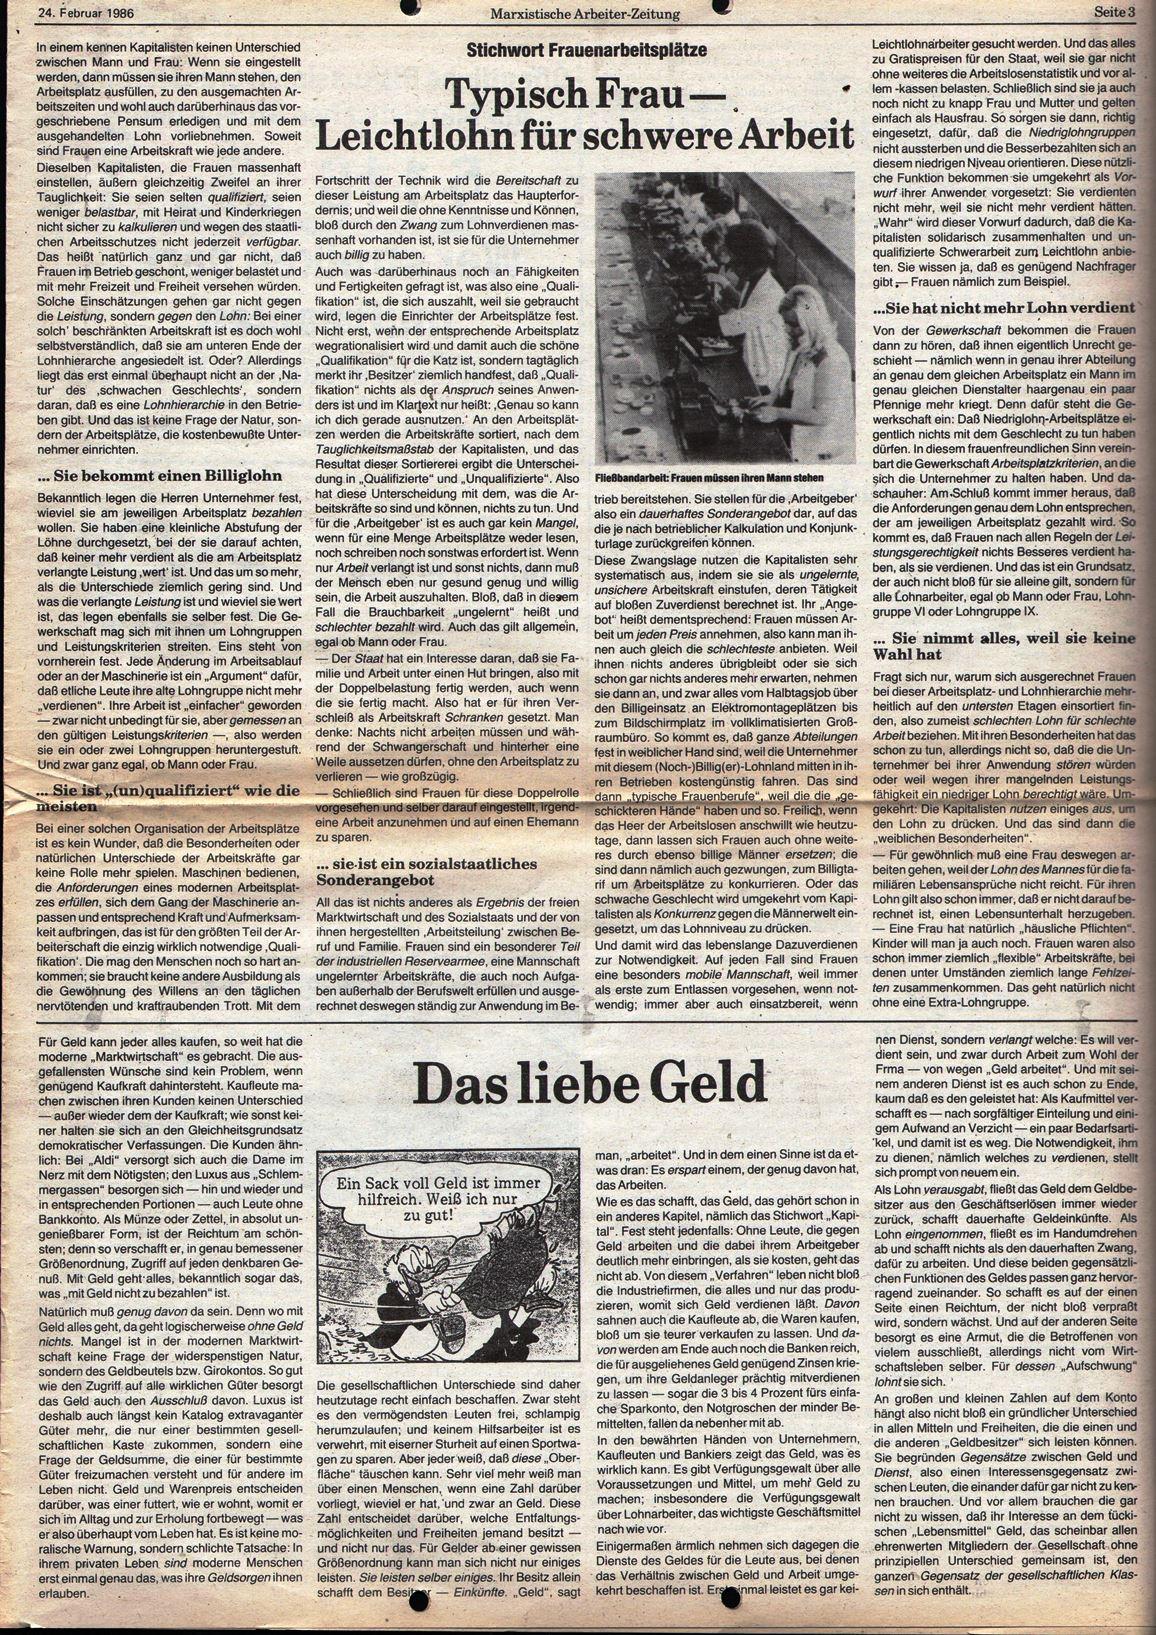 Muenchen_MG_MAZ_Lehrlinge_19860224_03